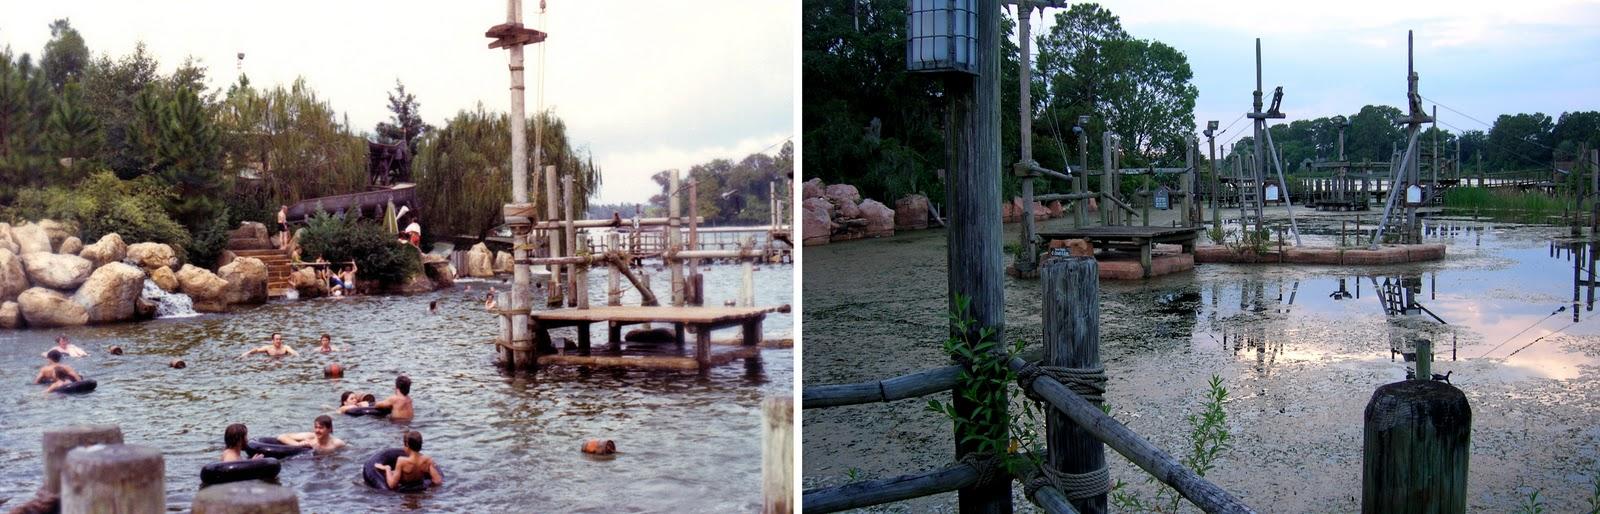 Disney Discovery Island Lake Buena Vista Florida Usa